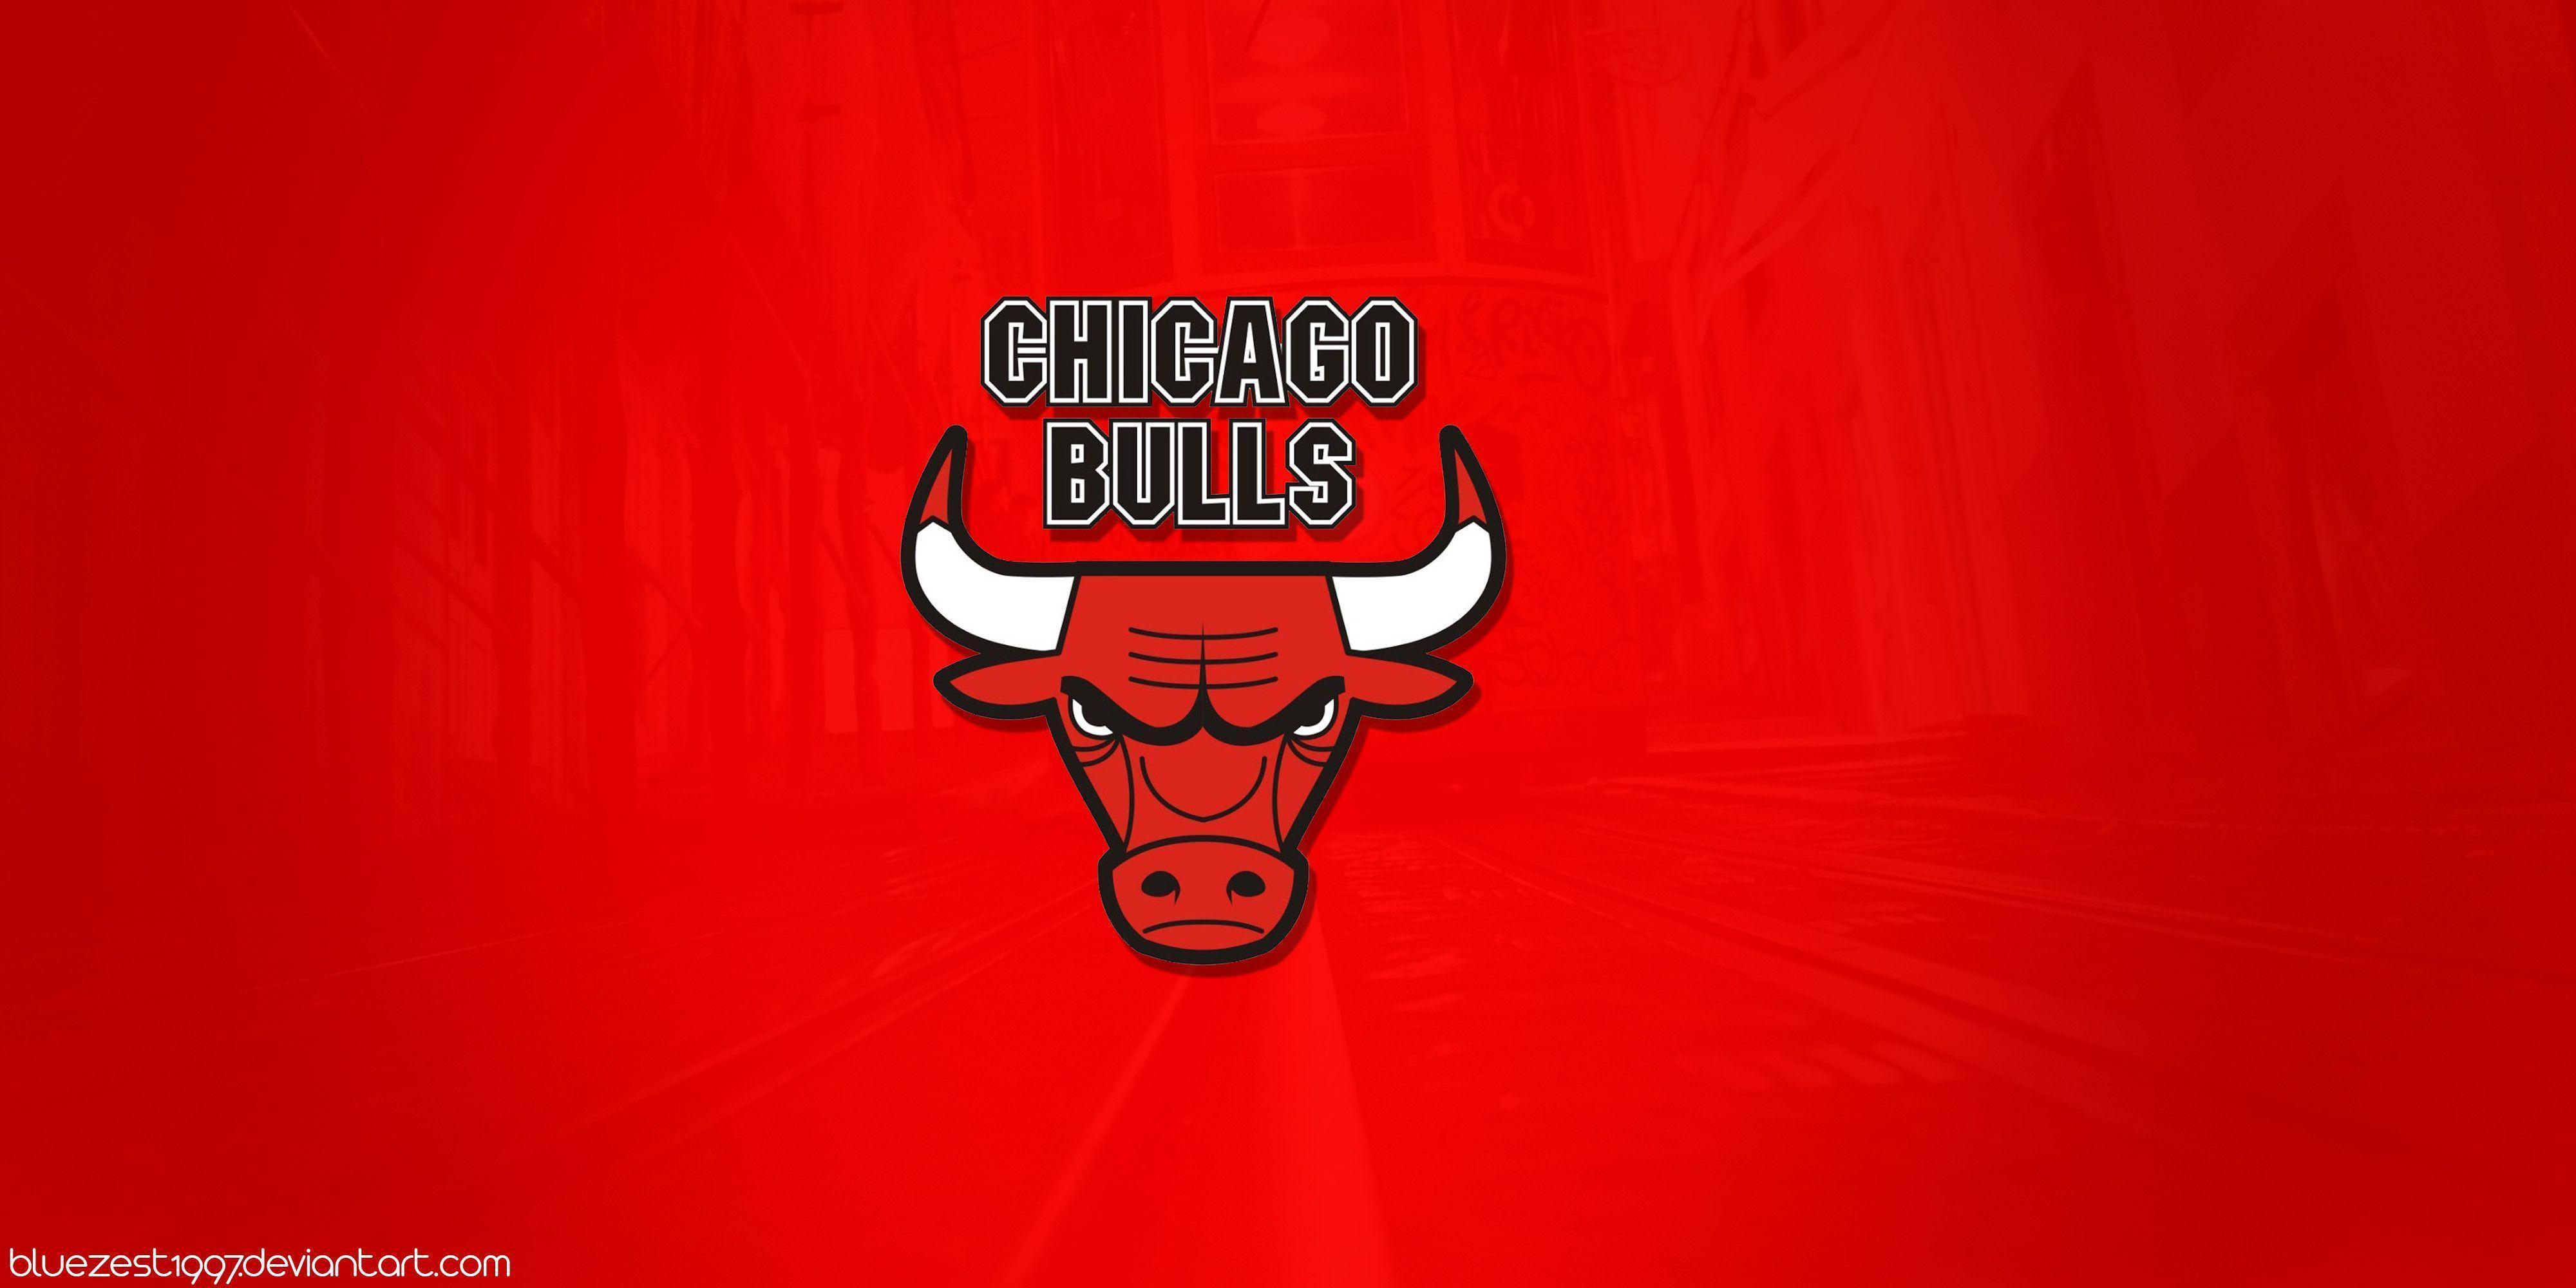 Red Chicago Bulls Logo Wallpaper #5300 Wallpaper | Wallshed.